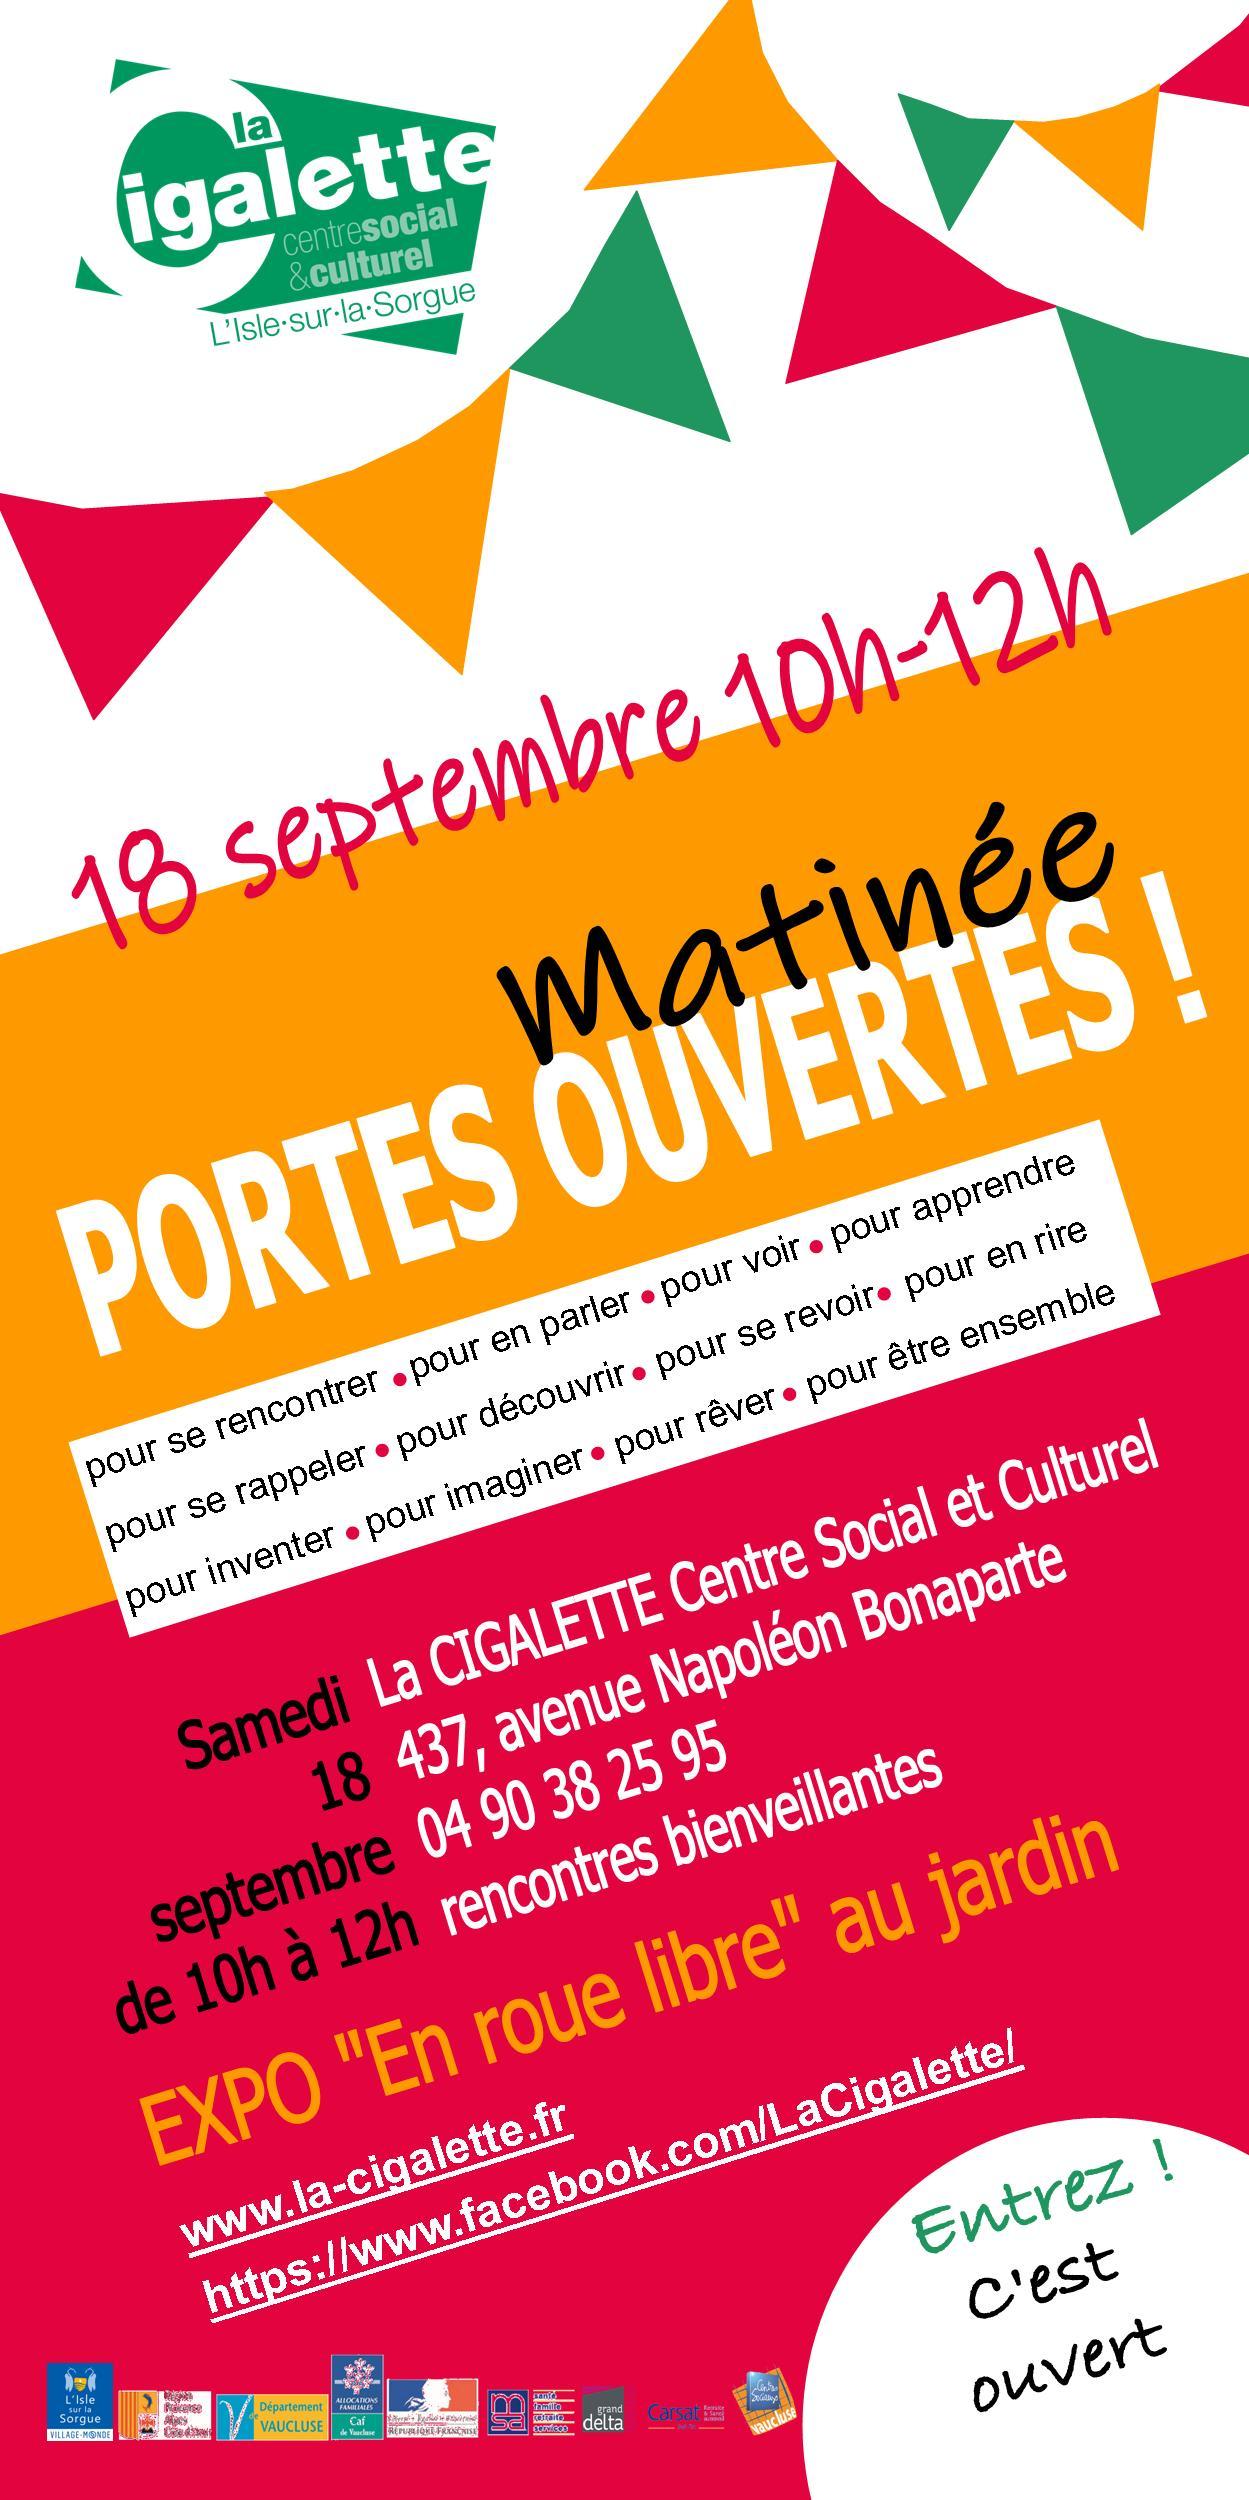 Affiche-portes-ouvertes-cigalette-180921-format-mairie-1.jpg